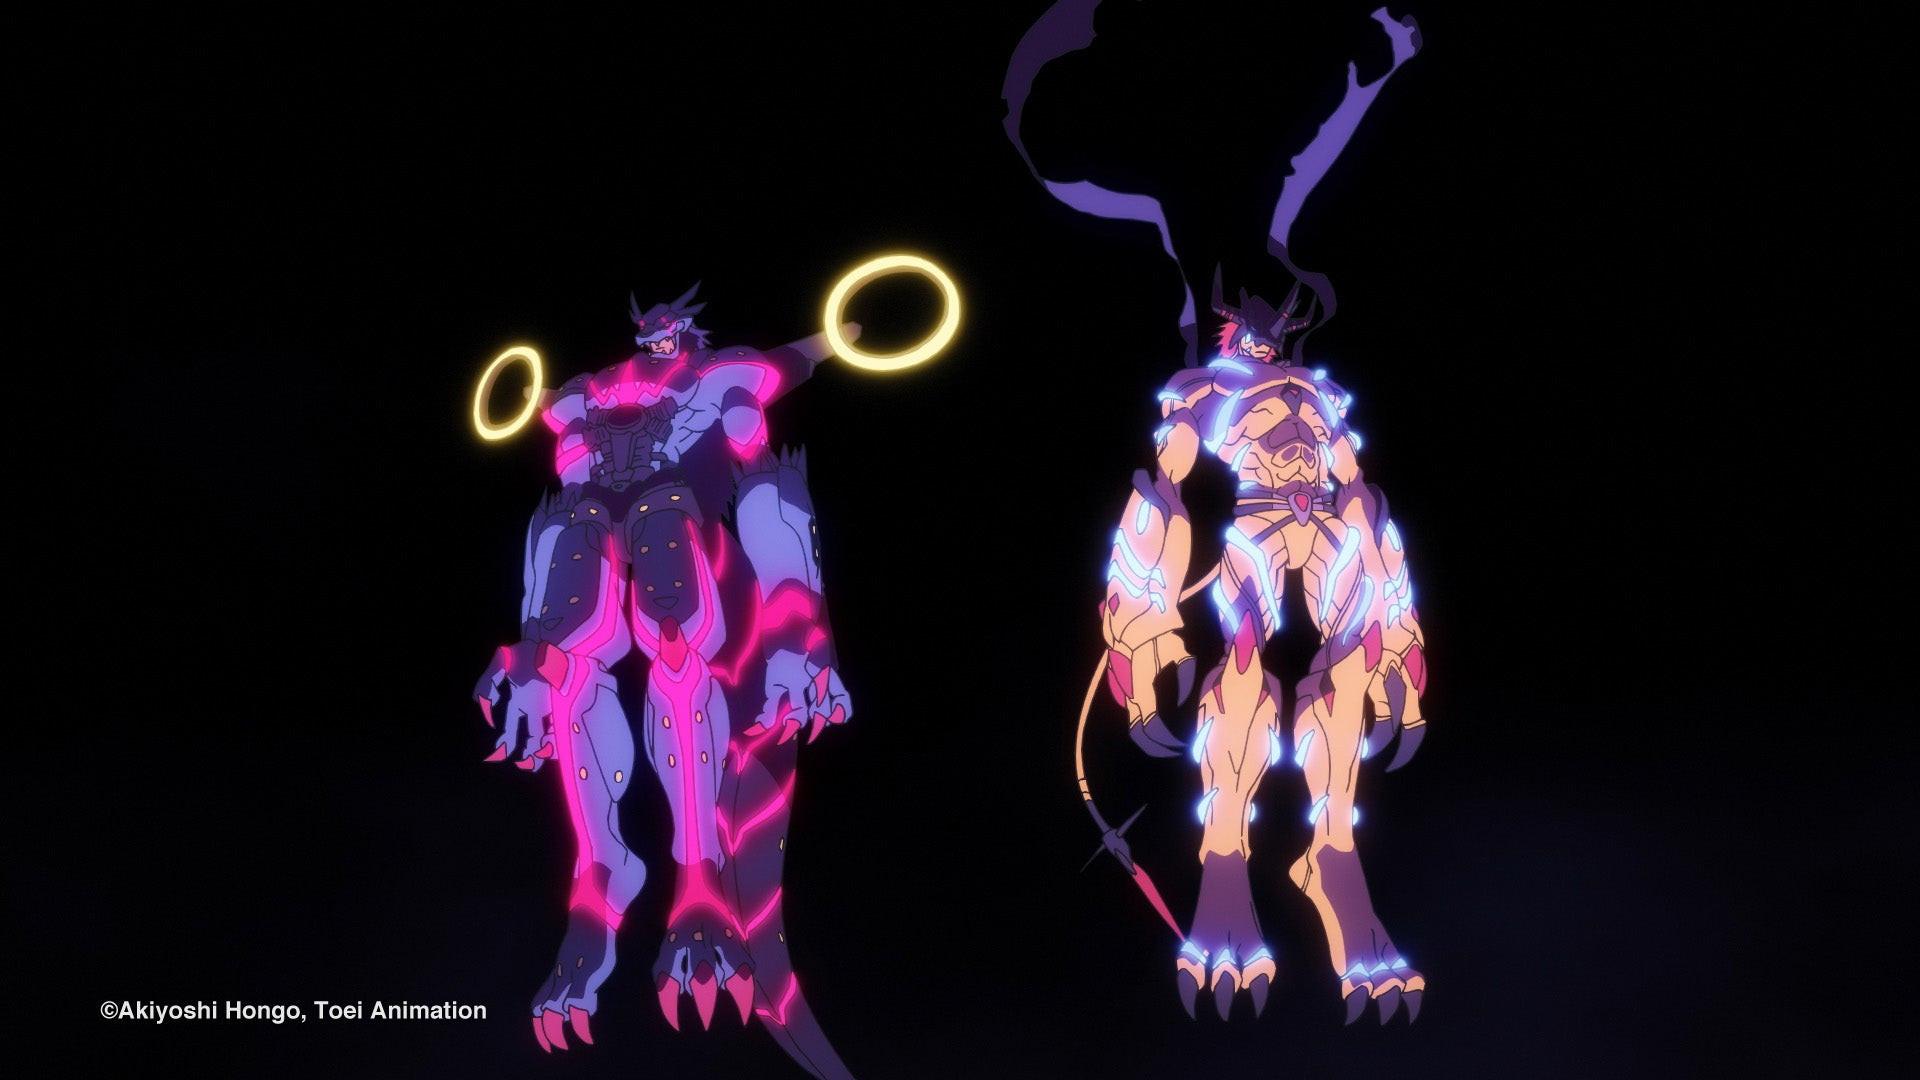 Digimon Adventure: Última Evolução Kizuna 2